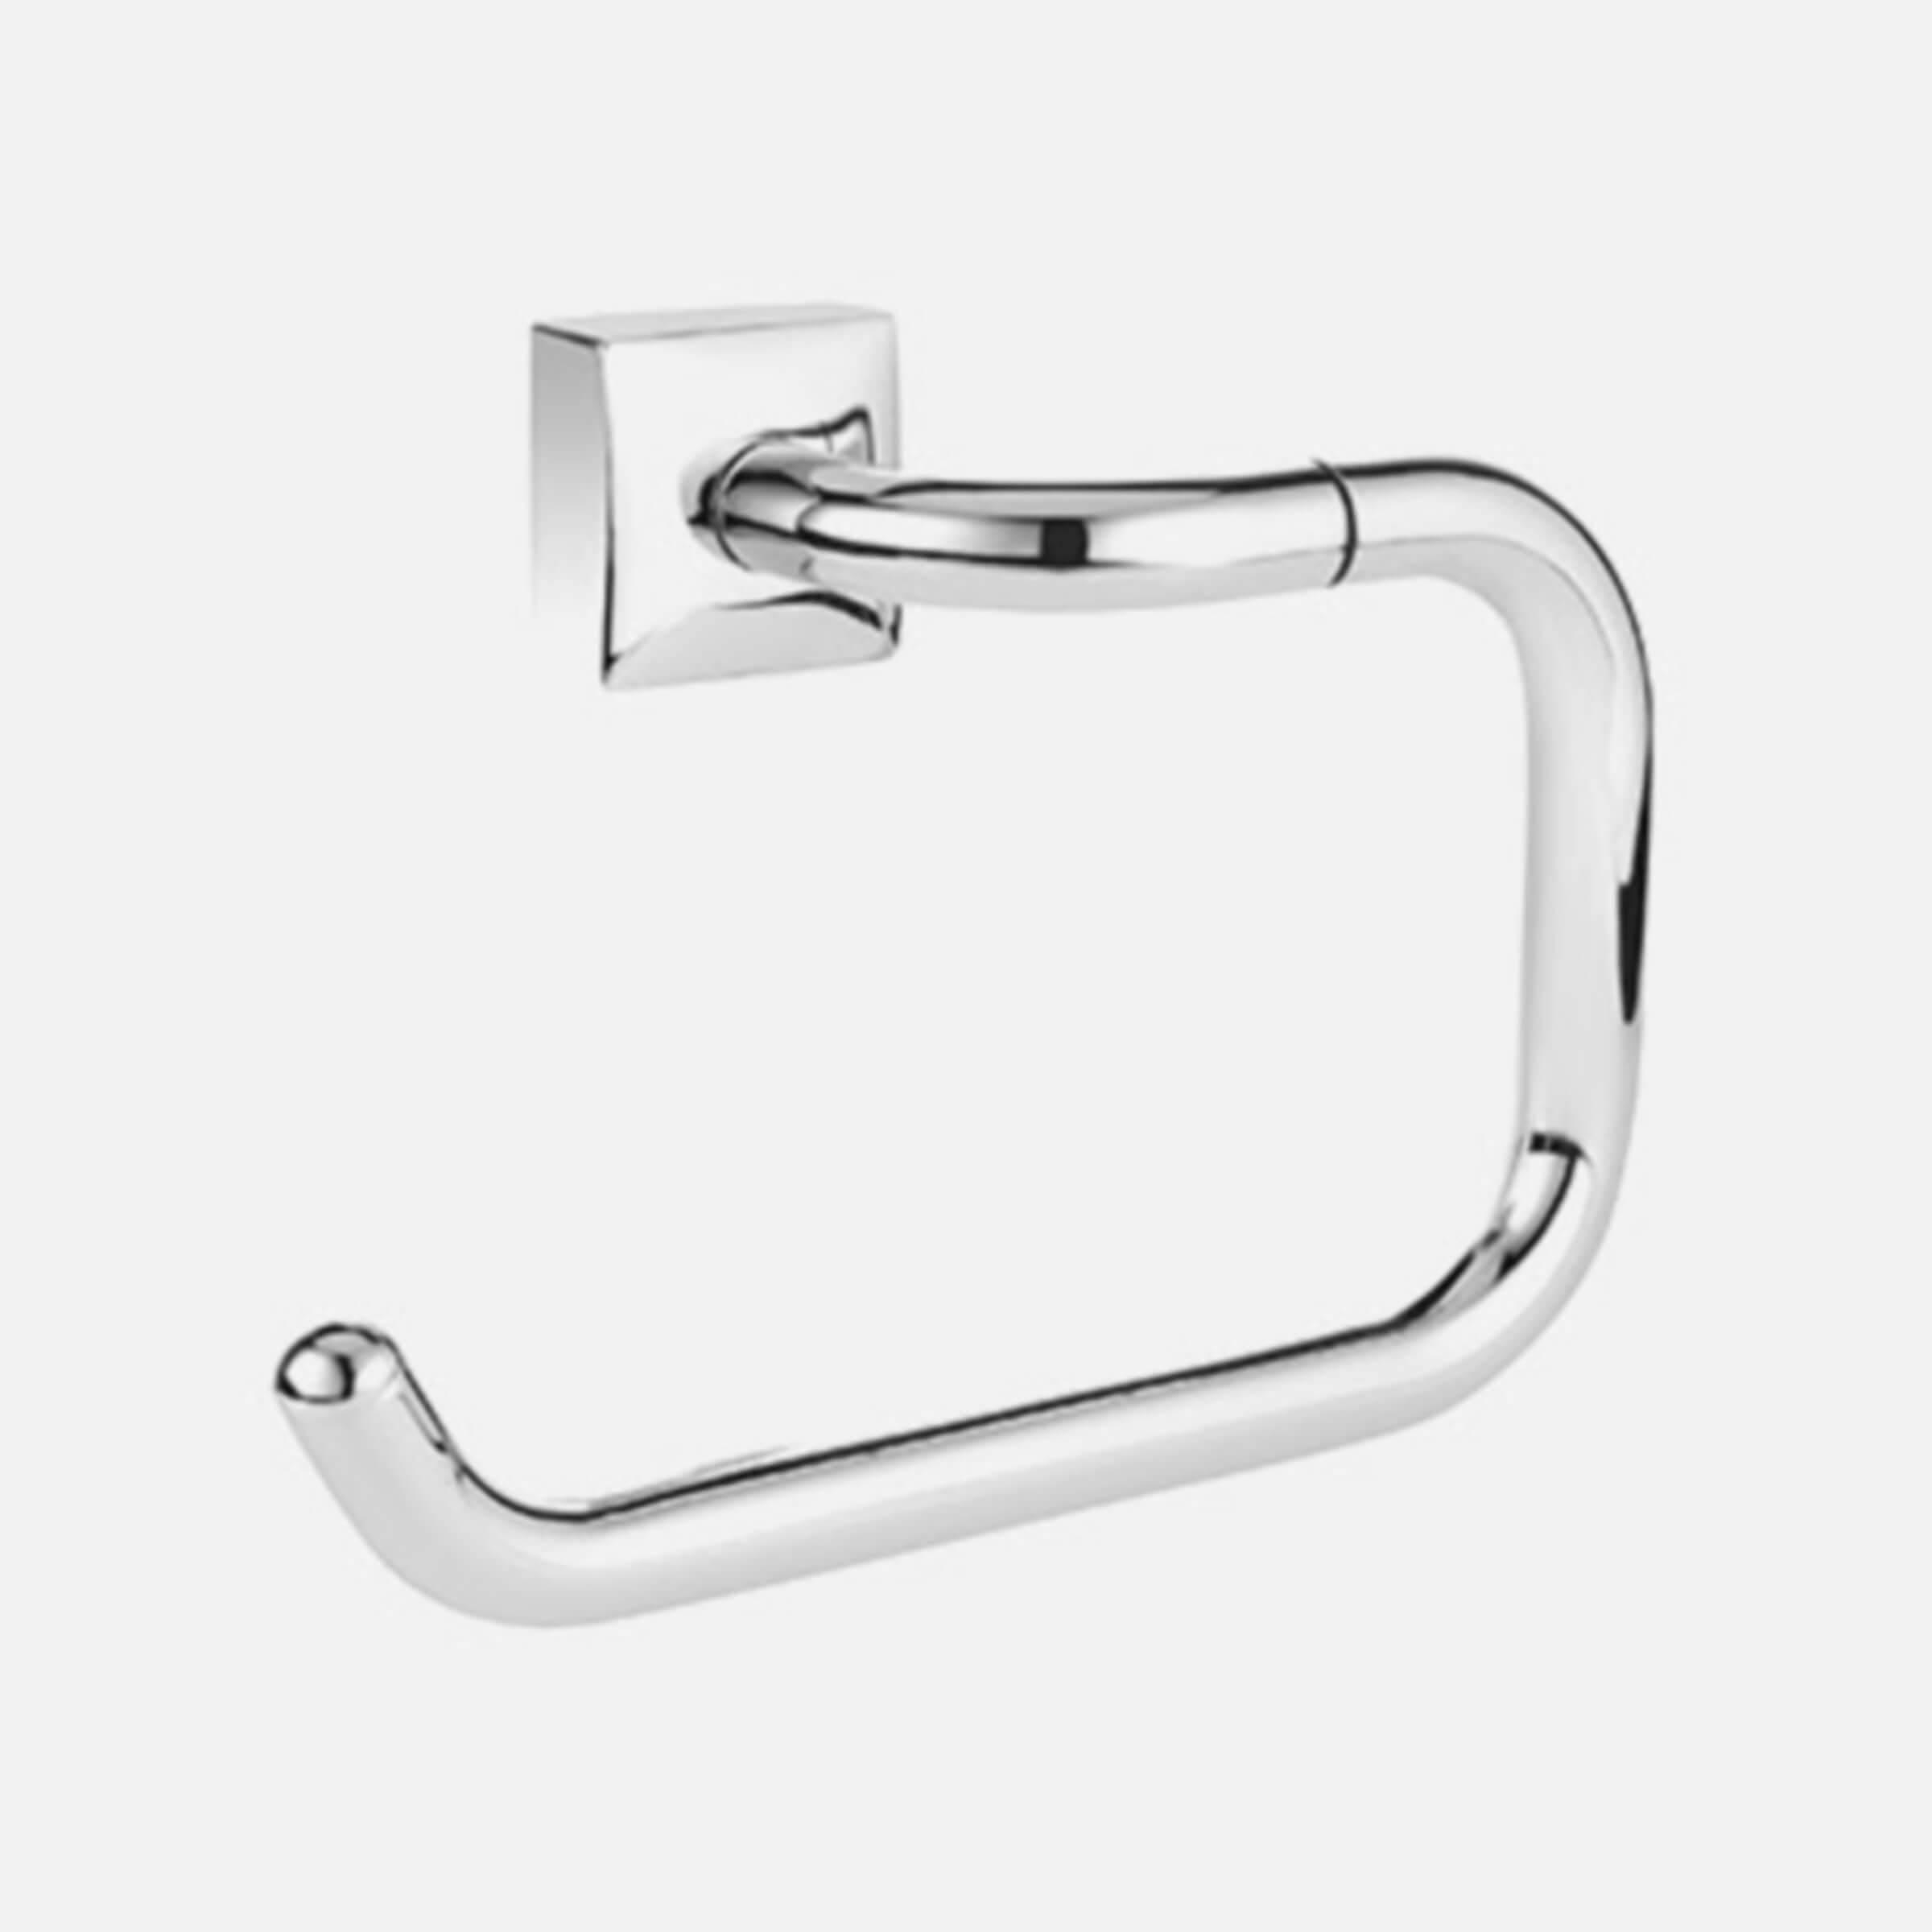 Bathroom Accessories | Bin, Tumbler, Toothbrush Holder, Soap Dish